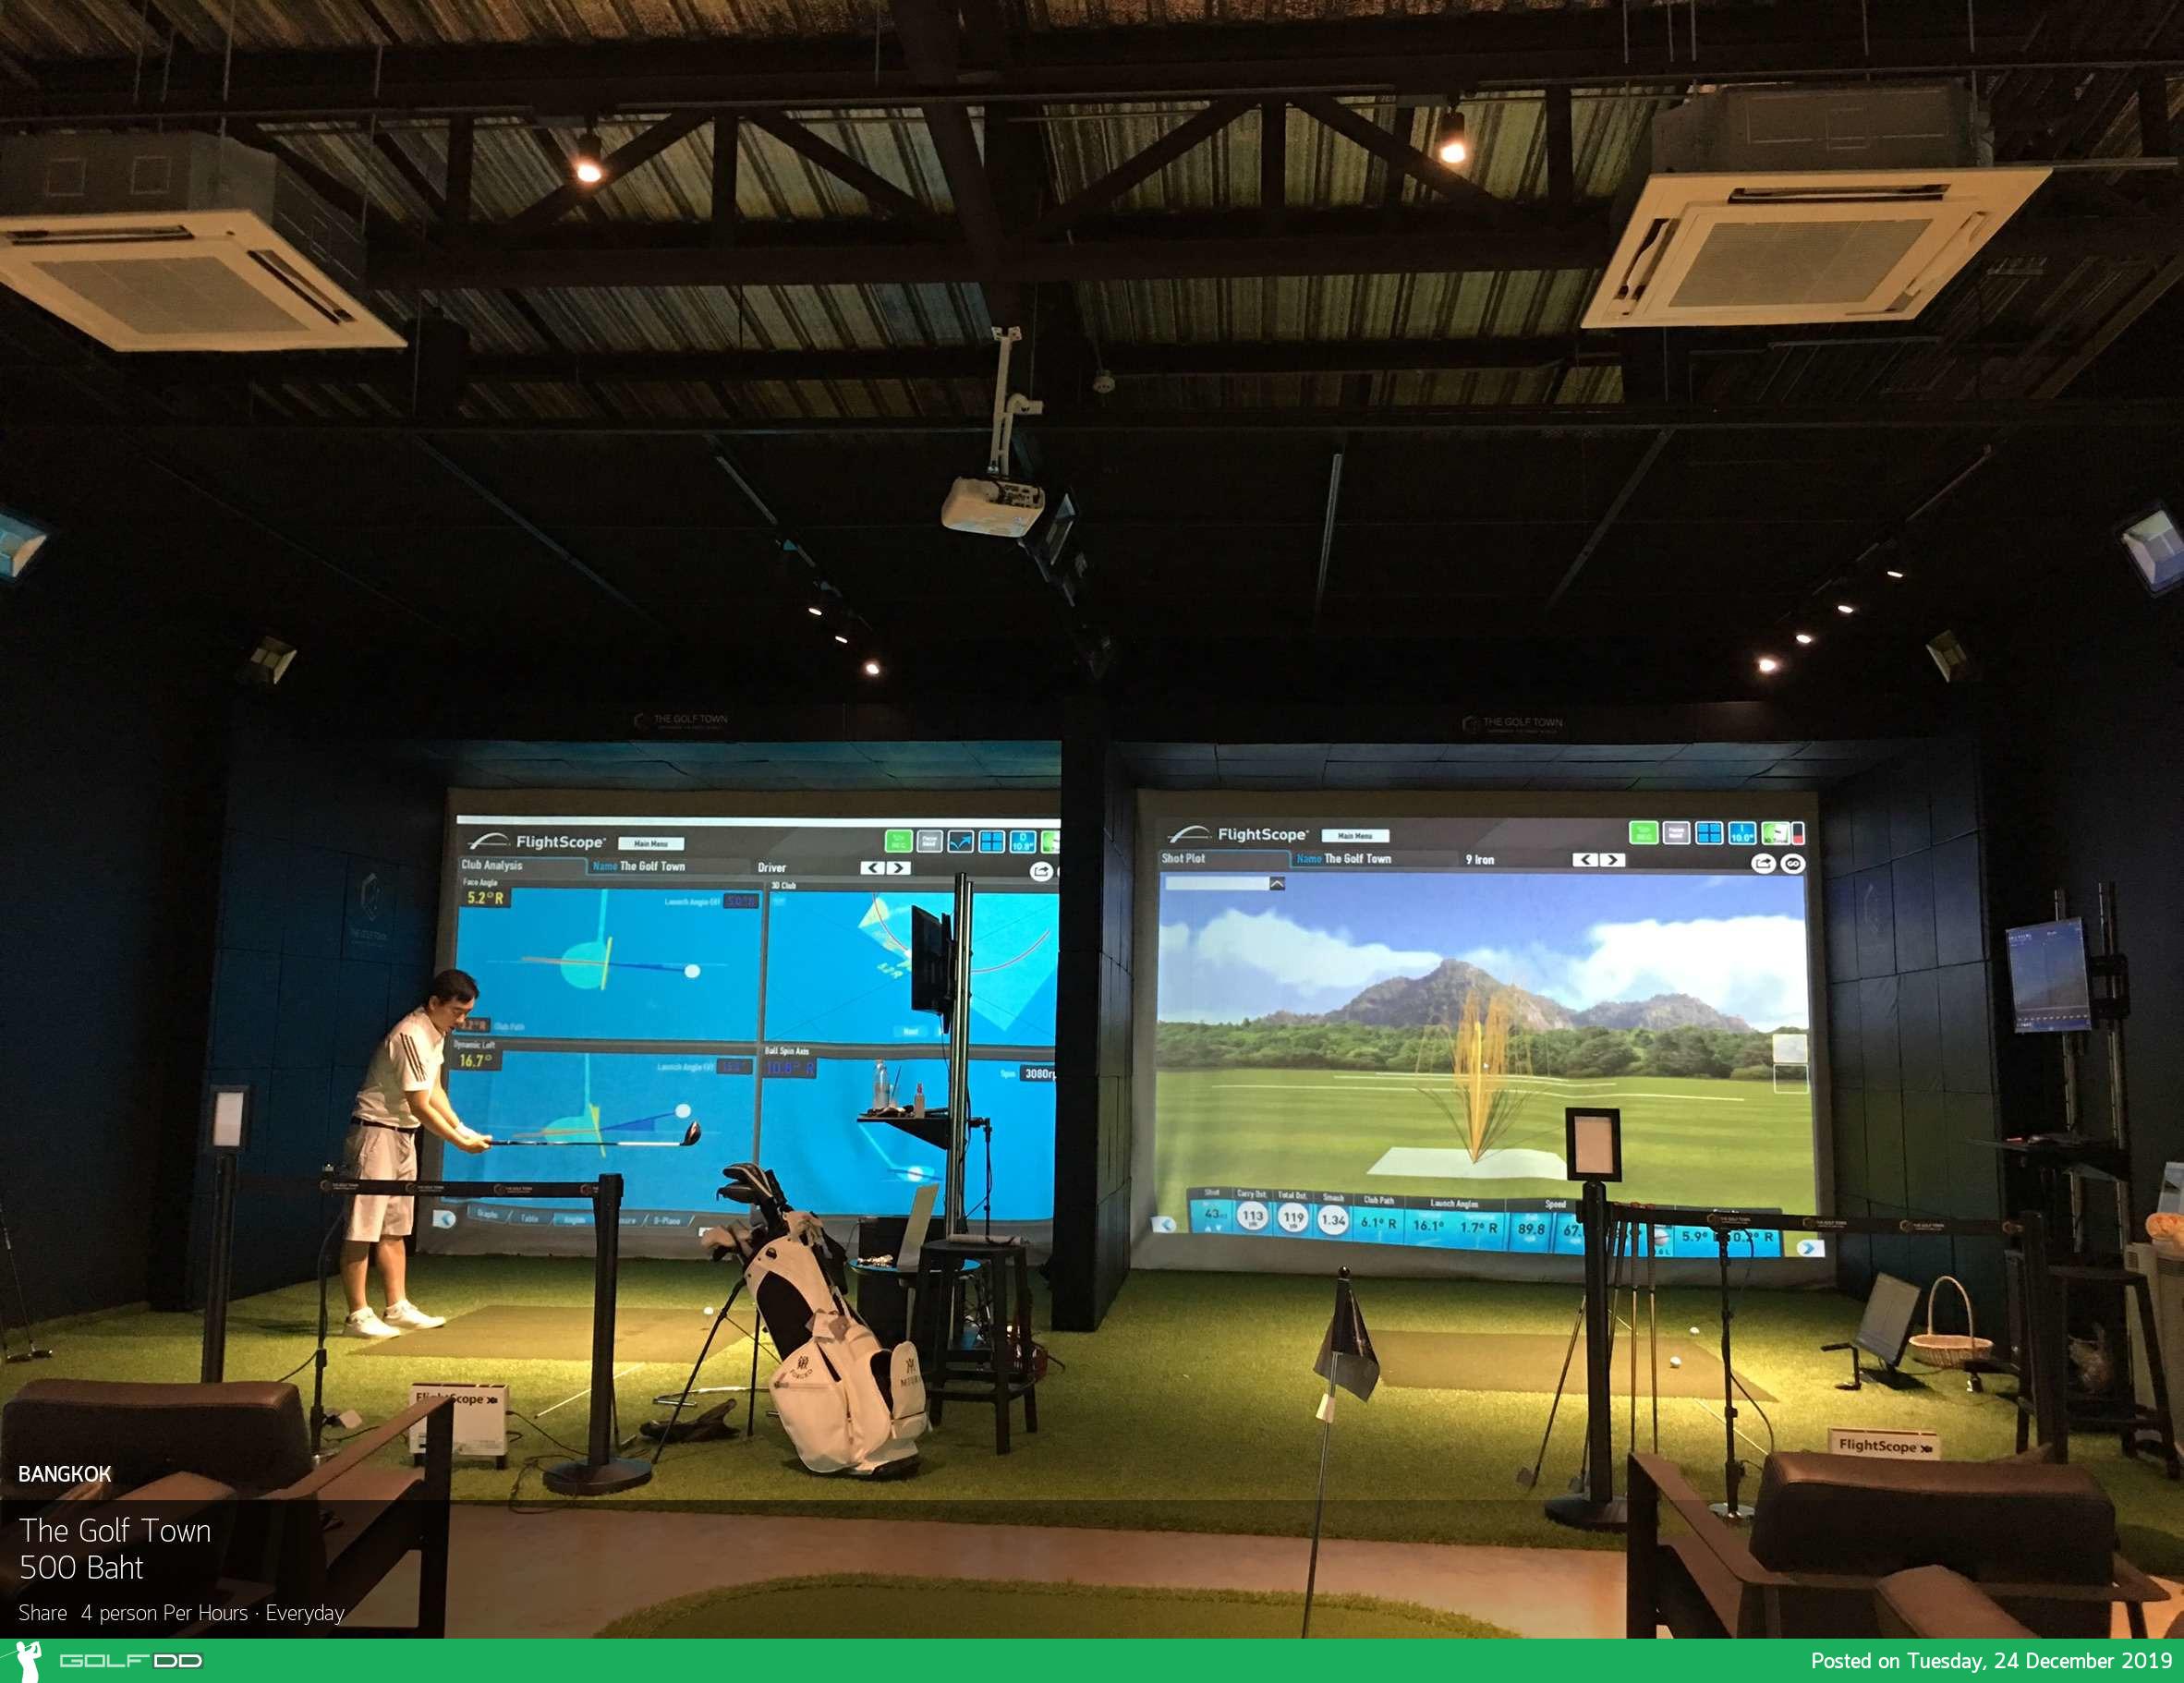 The Golf Town (Golf Simulator) ตีกอล์ฟห้องแอร์ หมดปัญหาค่าแคดดี้และรถกอล์ฟ